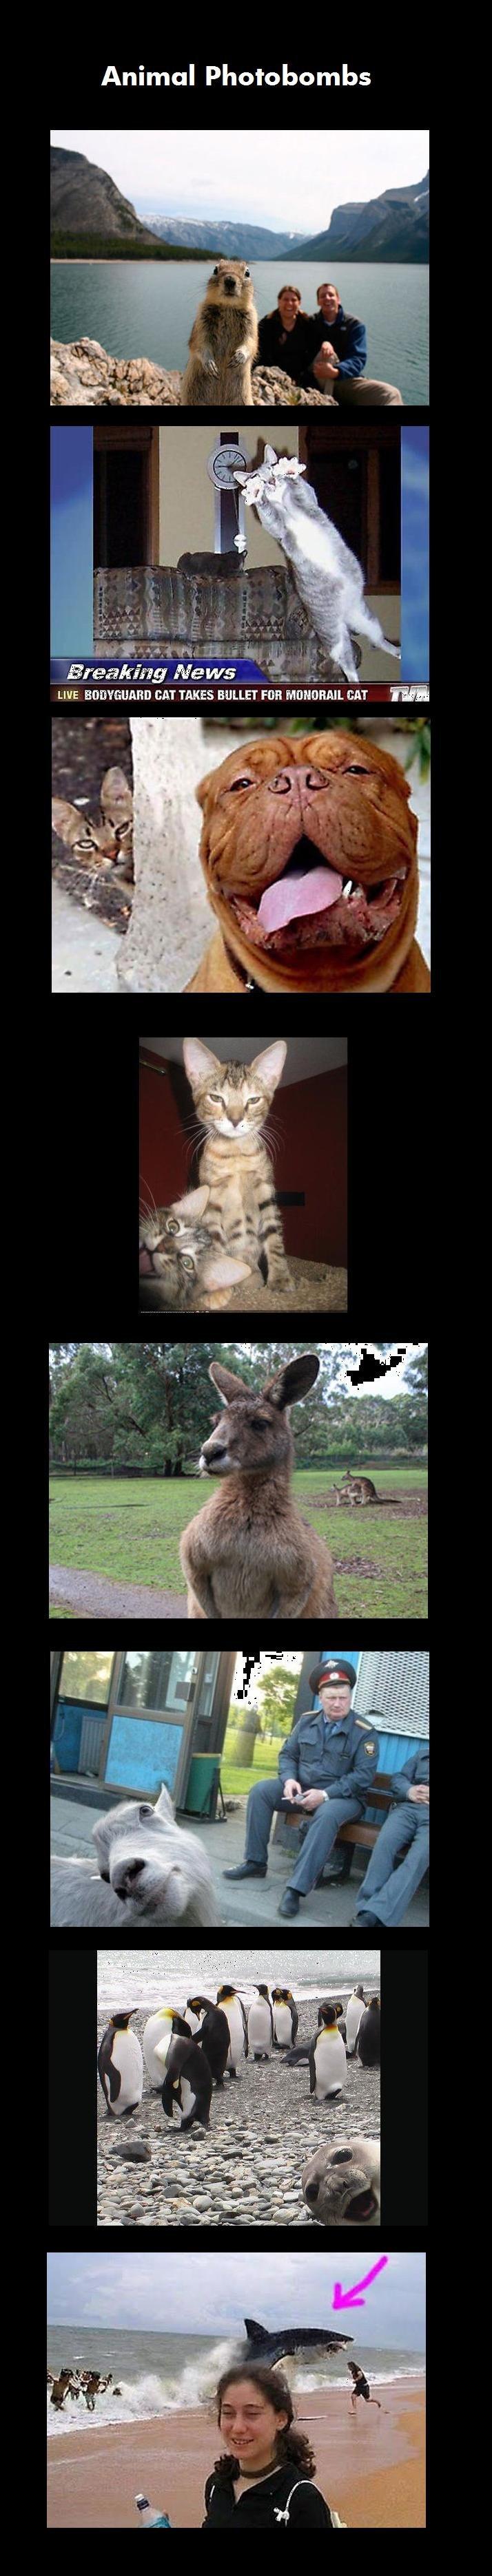 Animal Photobombs. . Animal Photobombs Breaking News _ _:Cr N, LIVE BAT TAKES BULLET rim MOMMIE BM' E Animals photobomb